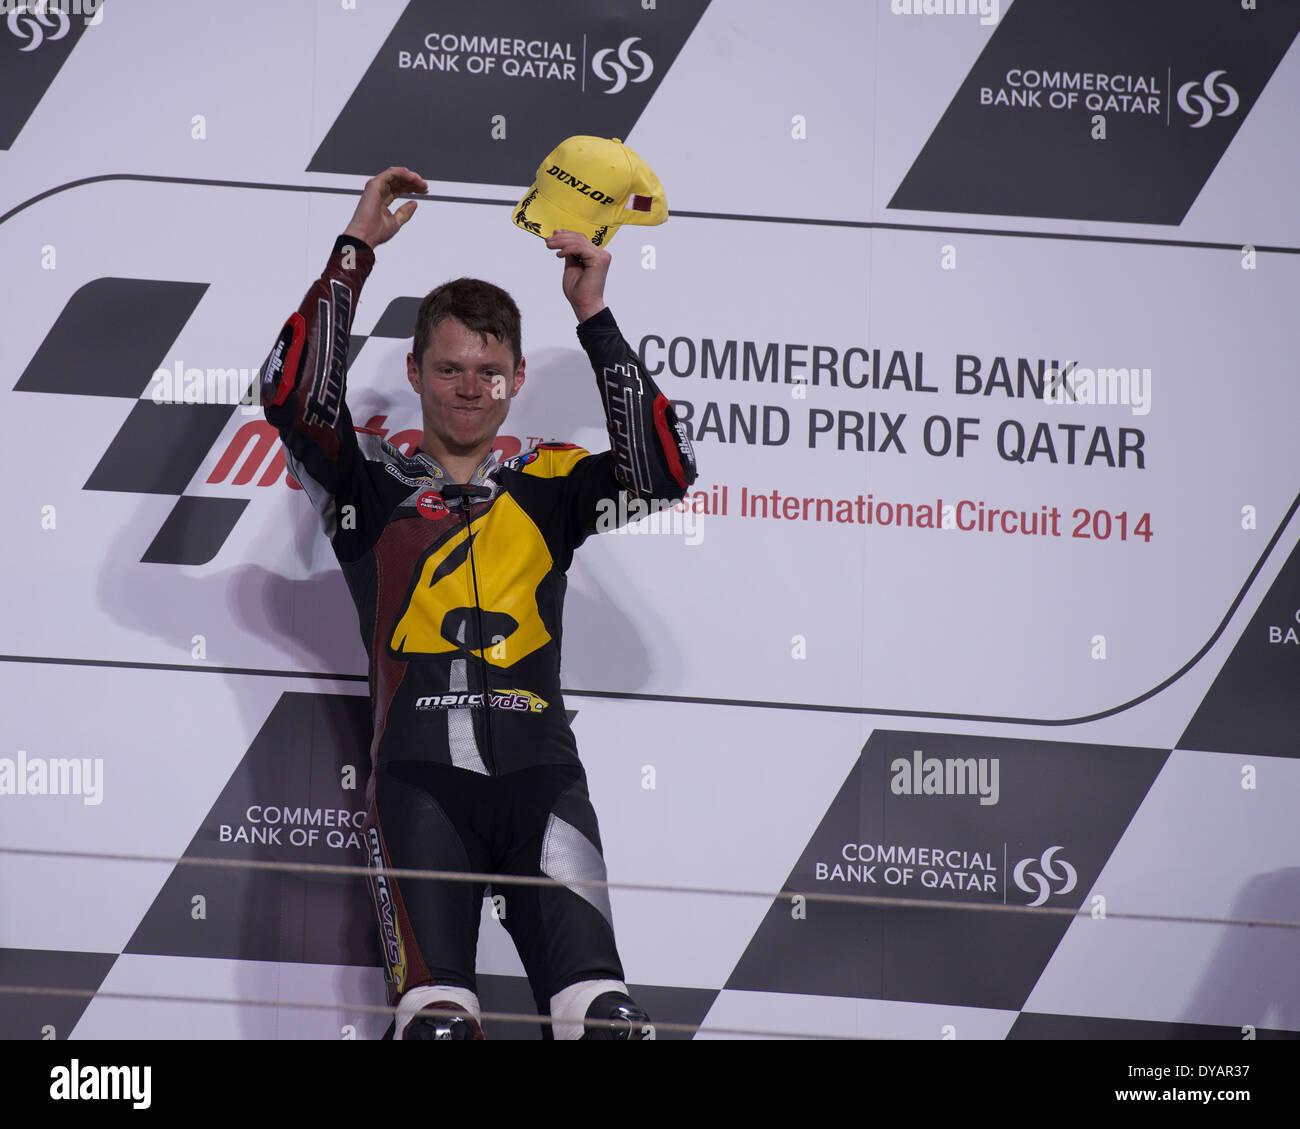 Losail Circuit, Doha, Qatar 23rd March 2014. Esteve Rabat celebrates after winning the Moto2 race - Stock Image